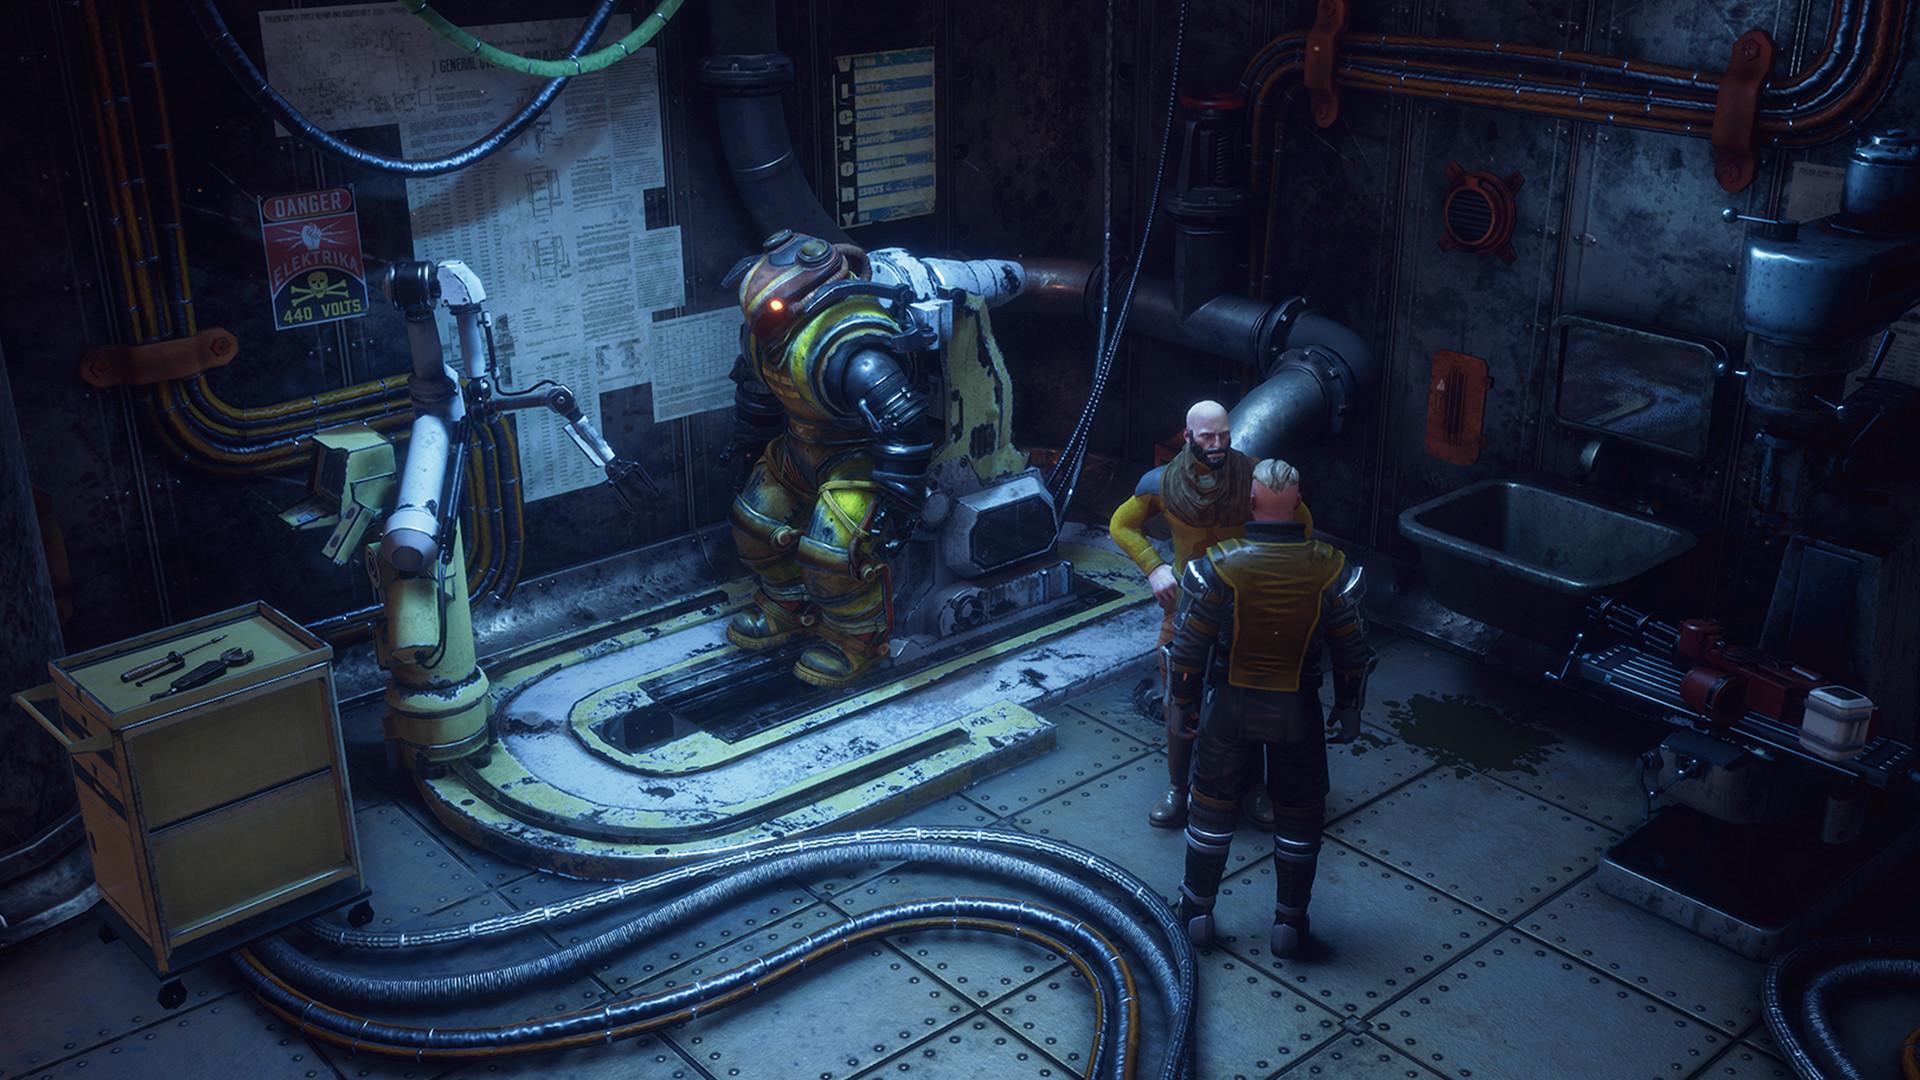 Insomnia: The Ark Screenshot 12 - Bilderquelle: HeroCraft